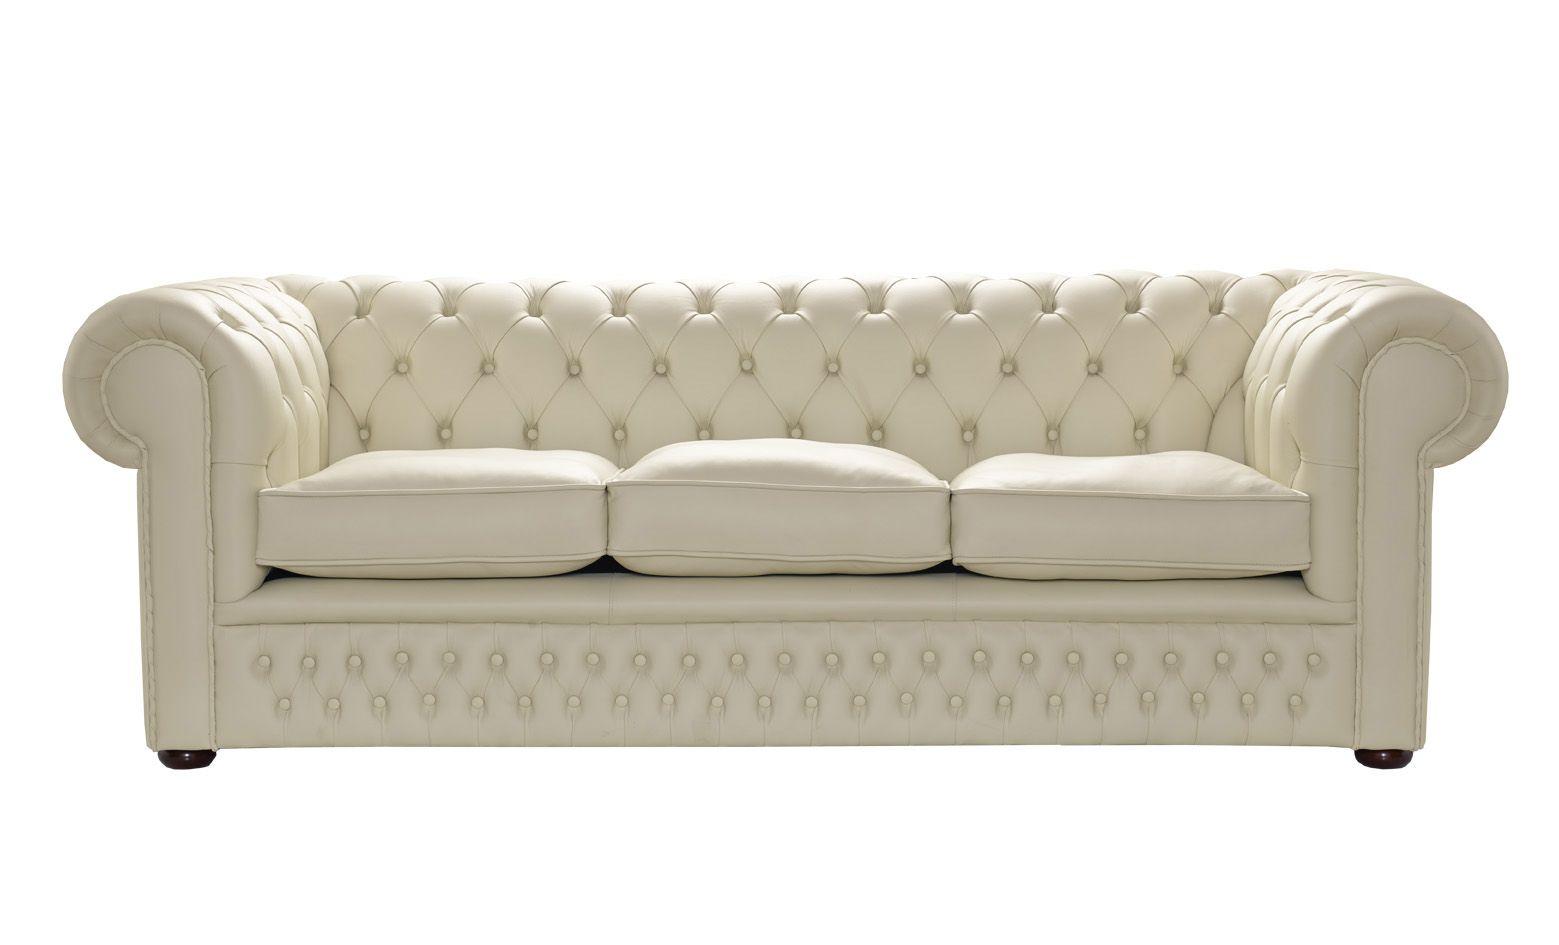 Cream Leather Sofa Sofa Couch Designs Cream Leather Sofa